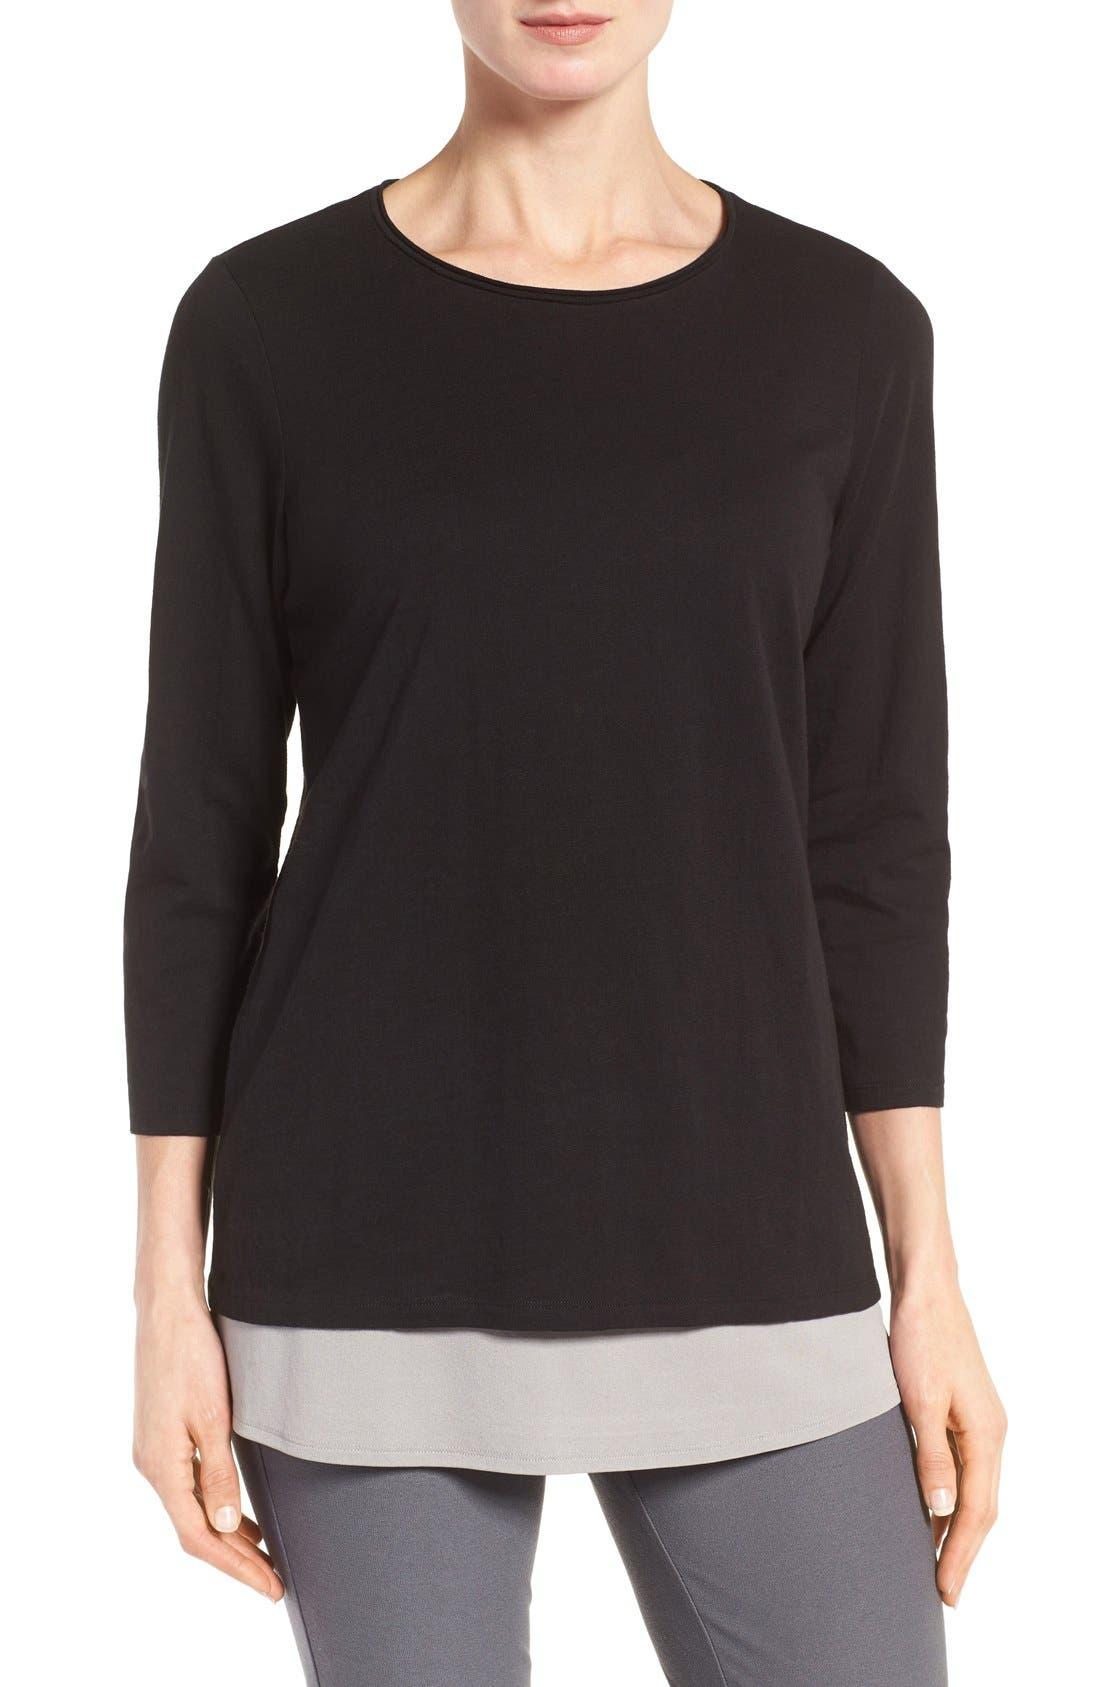 Eileen Fisher Slubby Organic Cotton Jersey Top